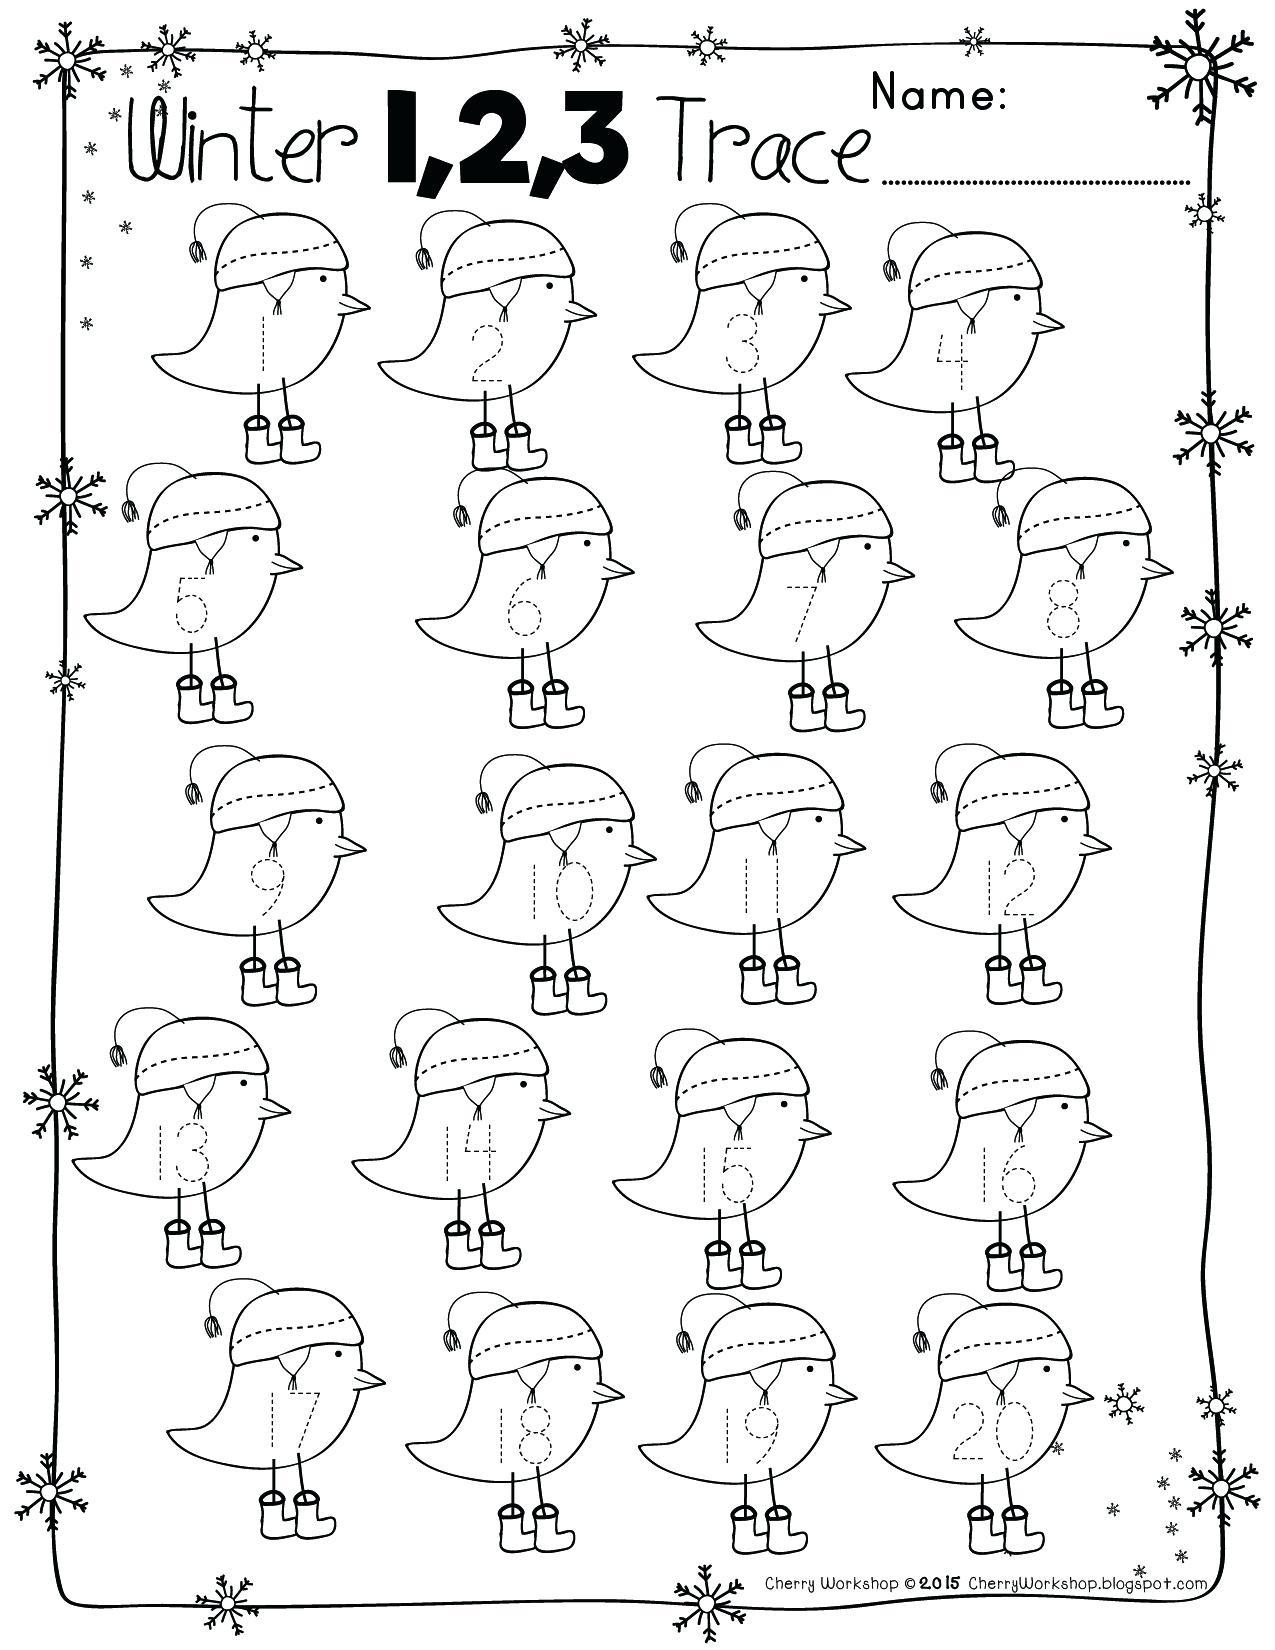 Abc Worksheets For Preschool – Shoppingforu.club - Free Abc Printables For Kindergarten